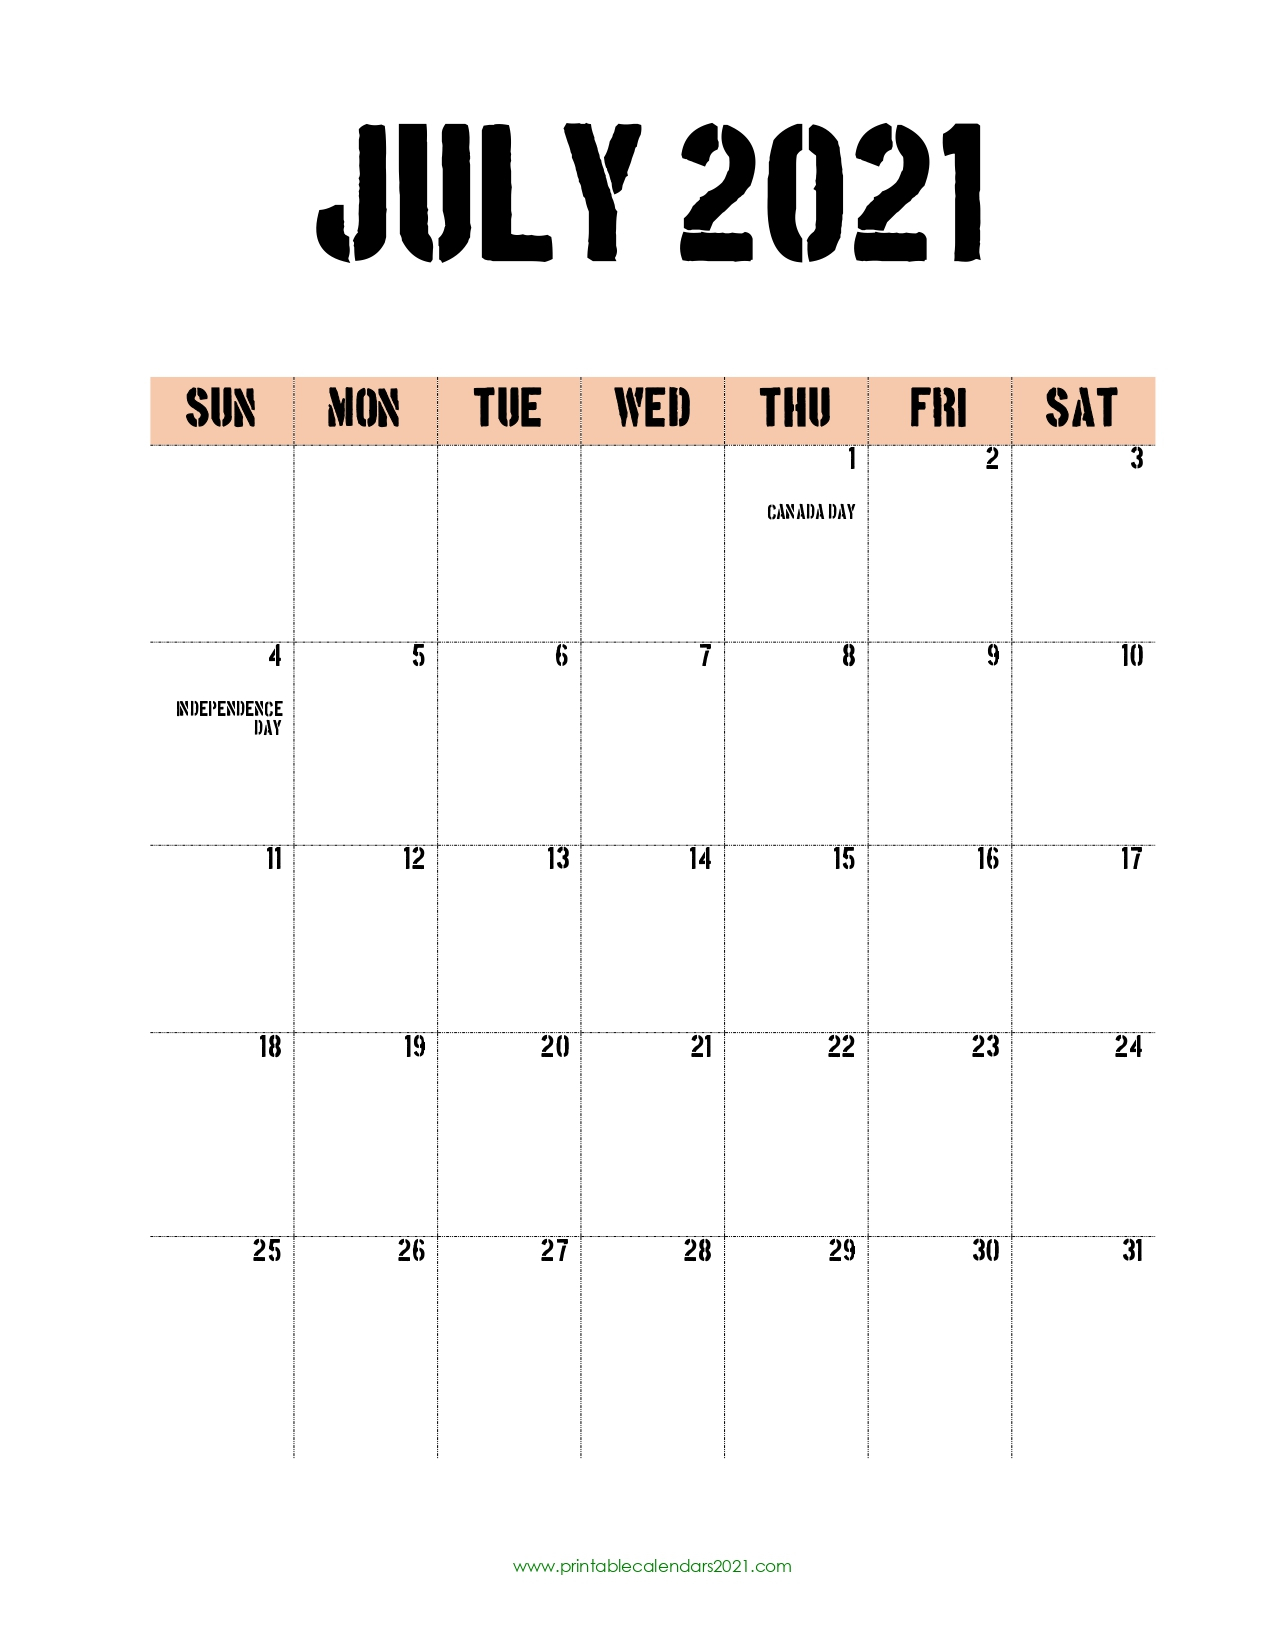 45+ July 2021 Calendar Printable, July 2021 Calendar Pdf in Print Free July 2021 Calendar Without Downloading